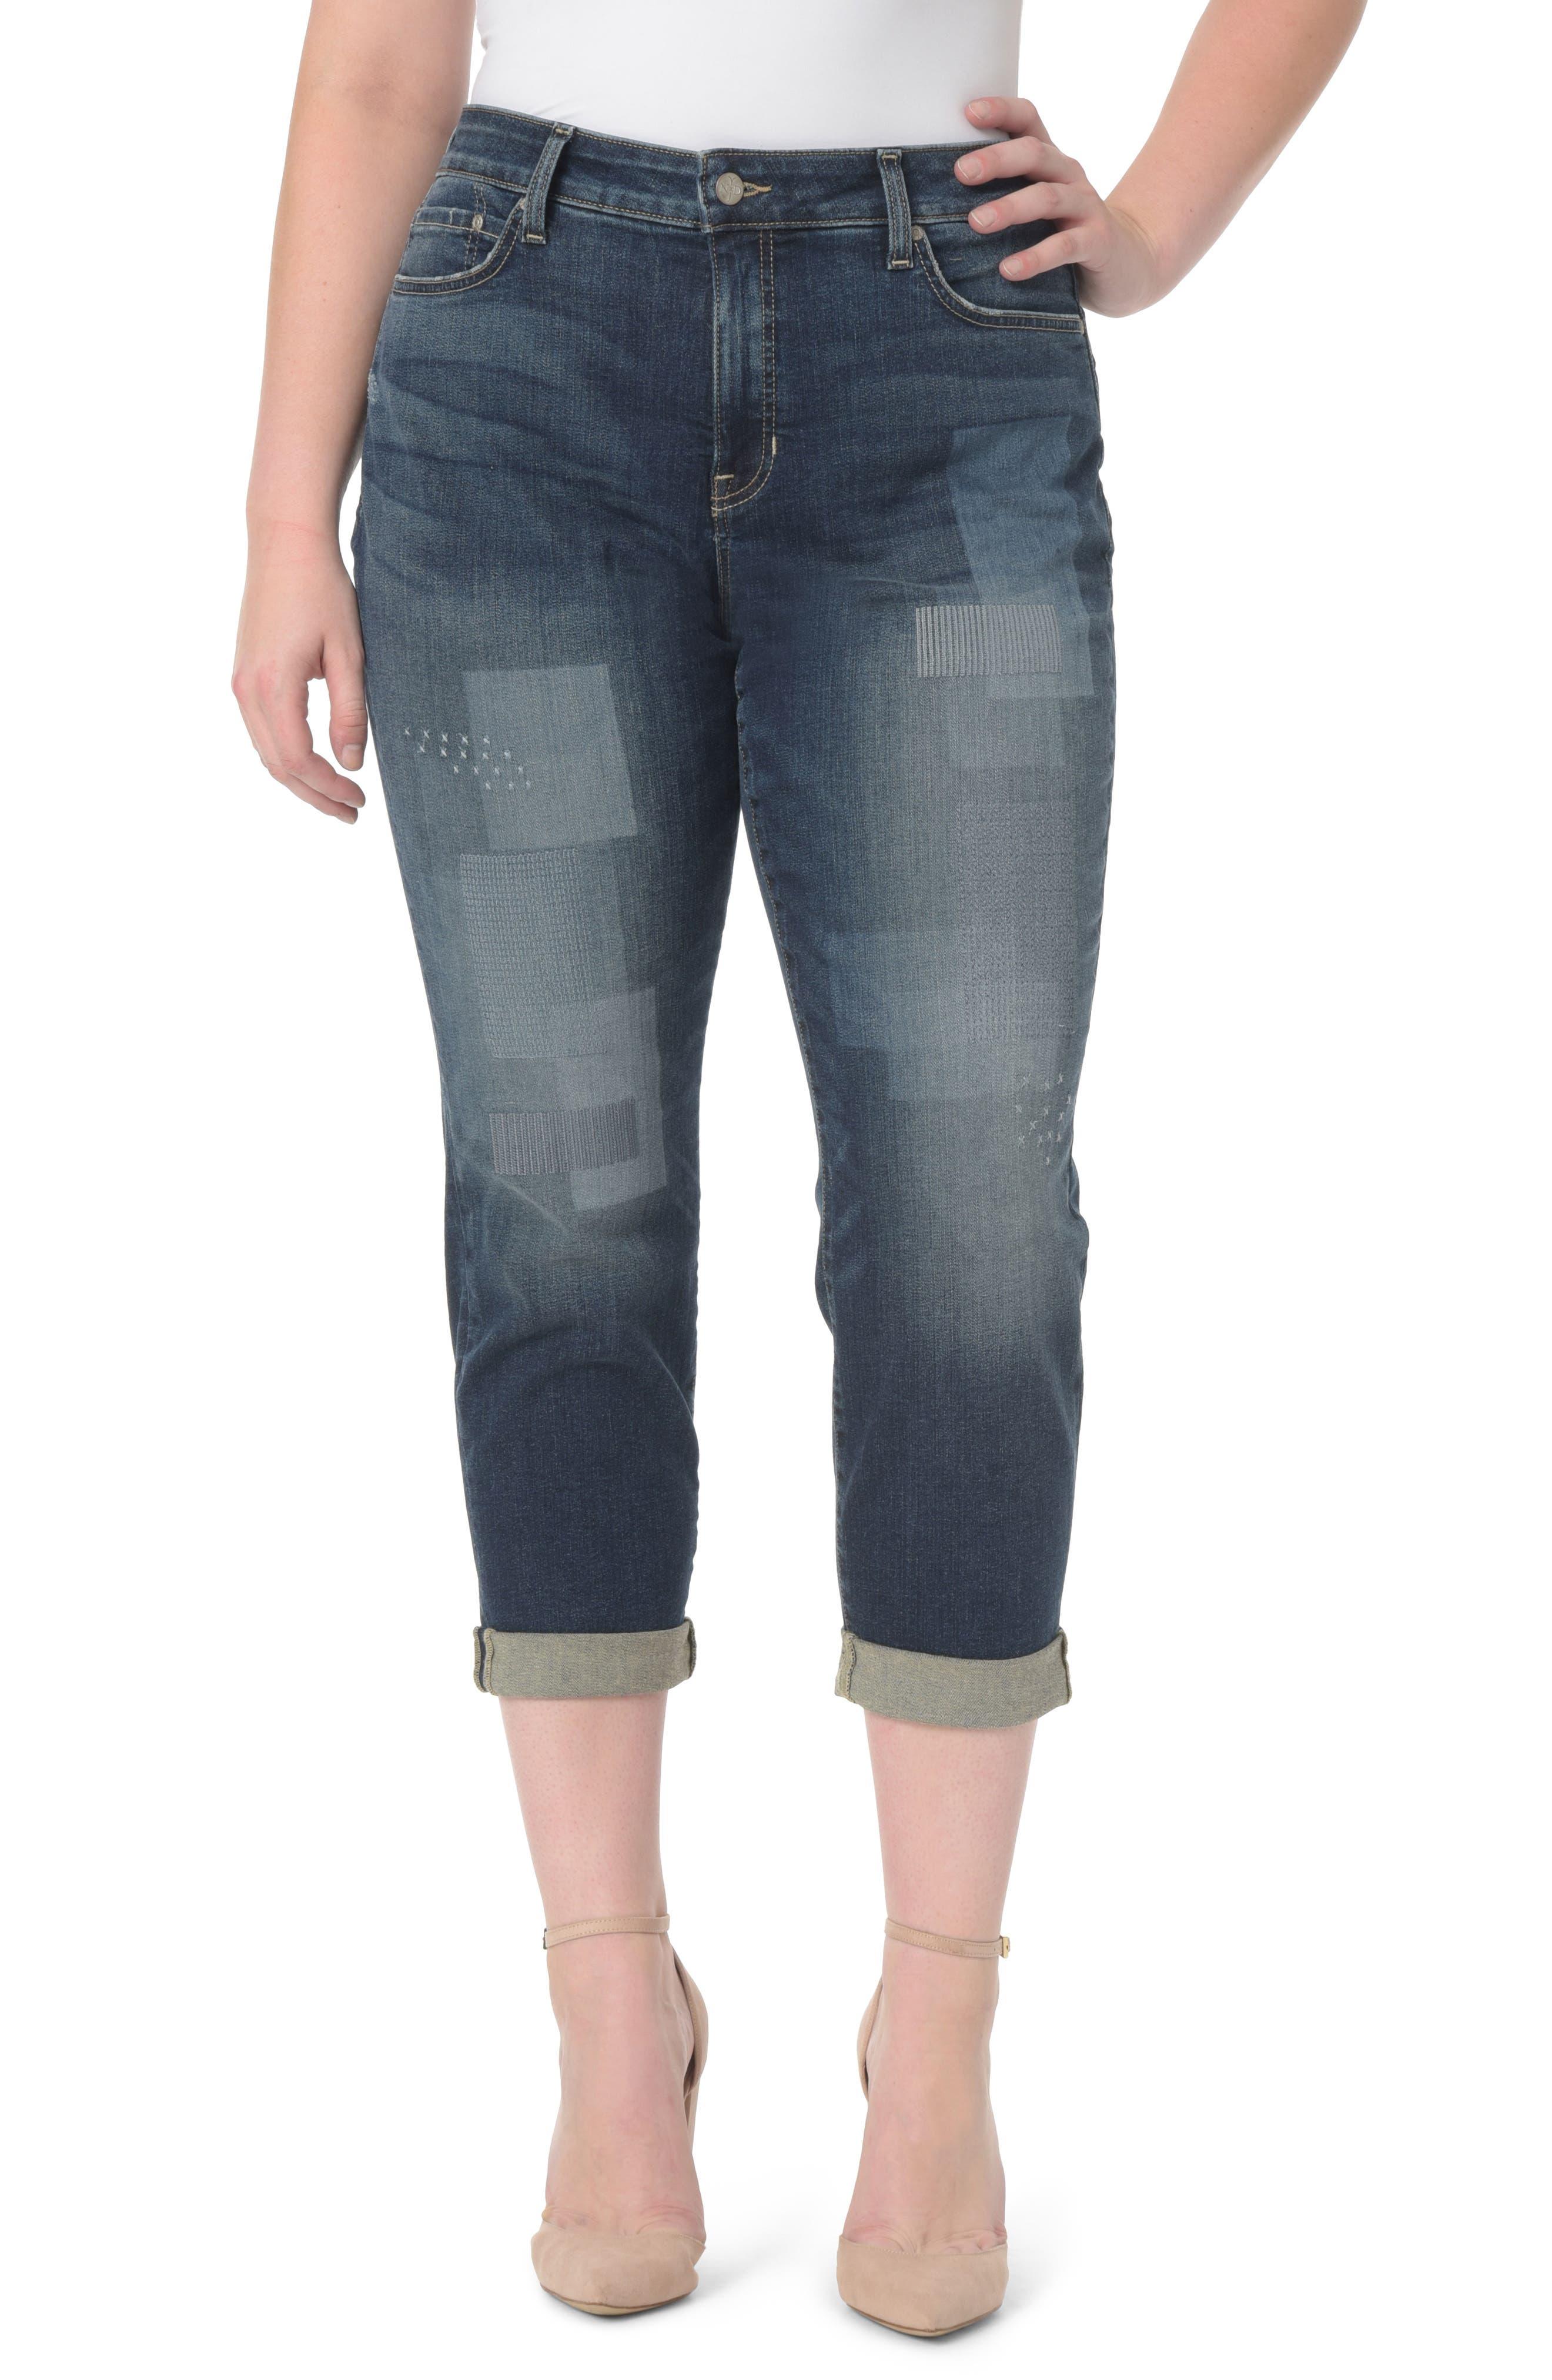 Alternate Image 1 Selected - NYDJ Shadow Patch Stretch Boyfriend Jeans (Horizon) (Plus Size)